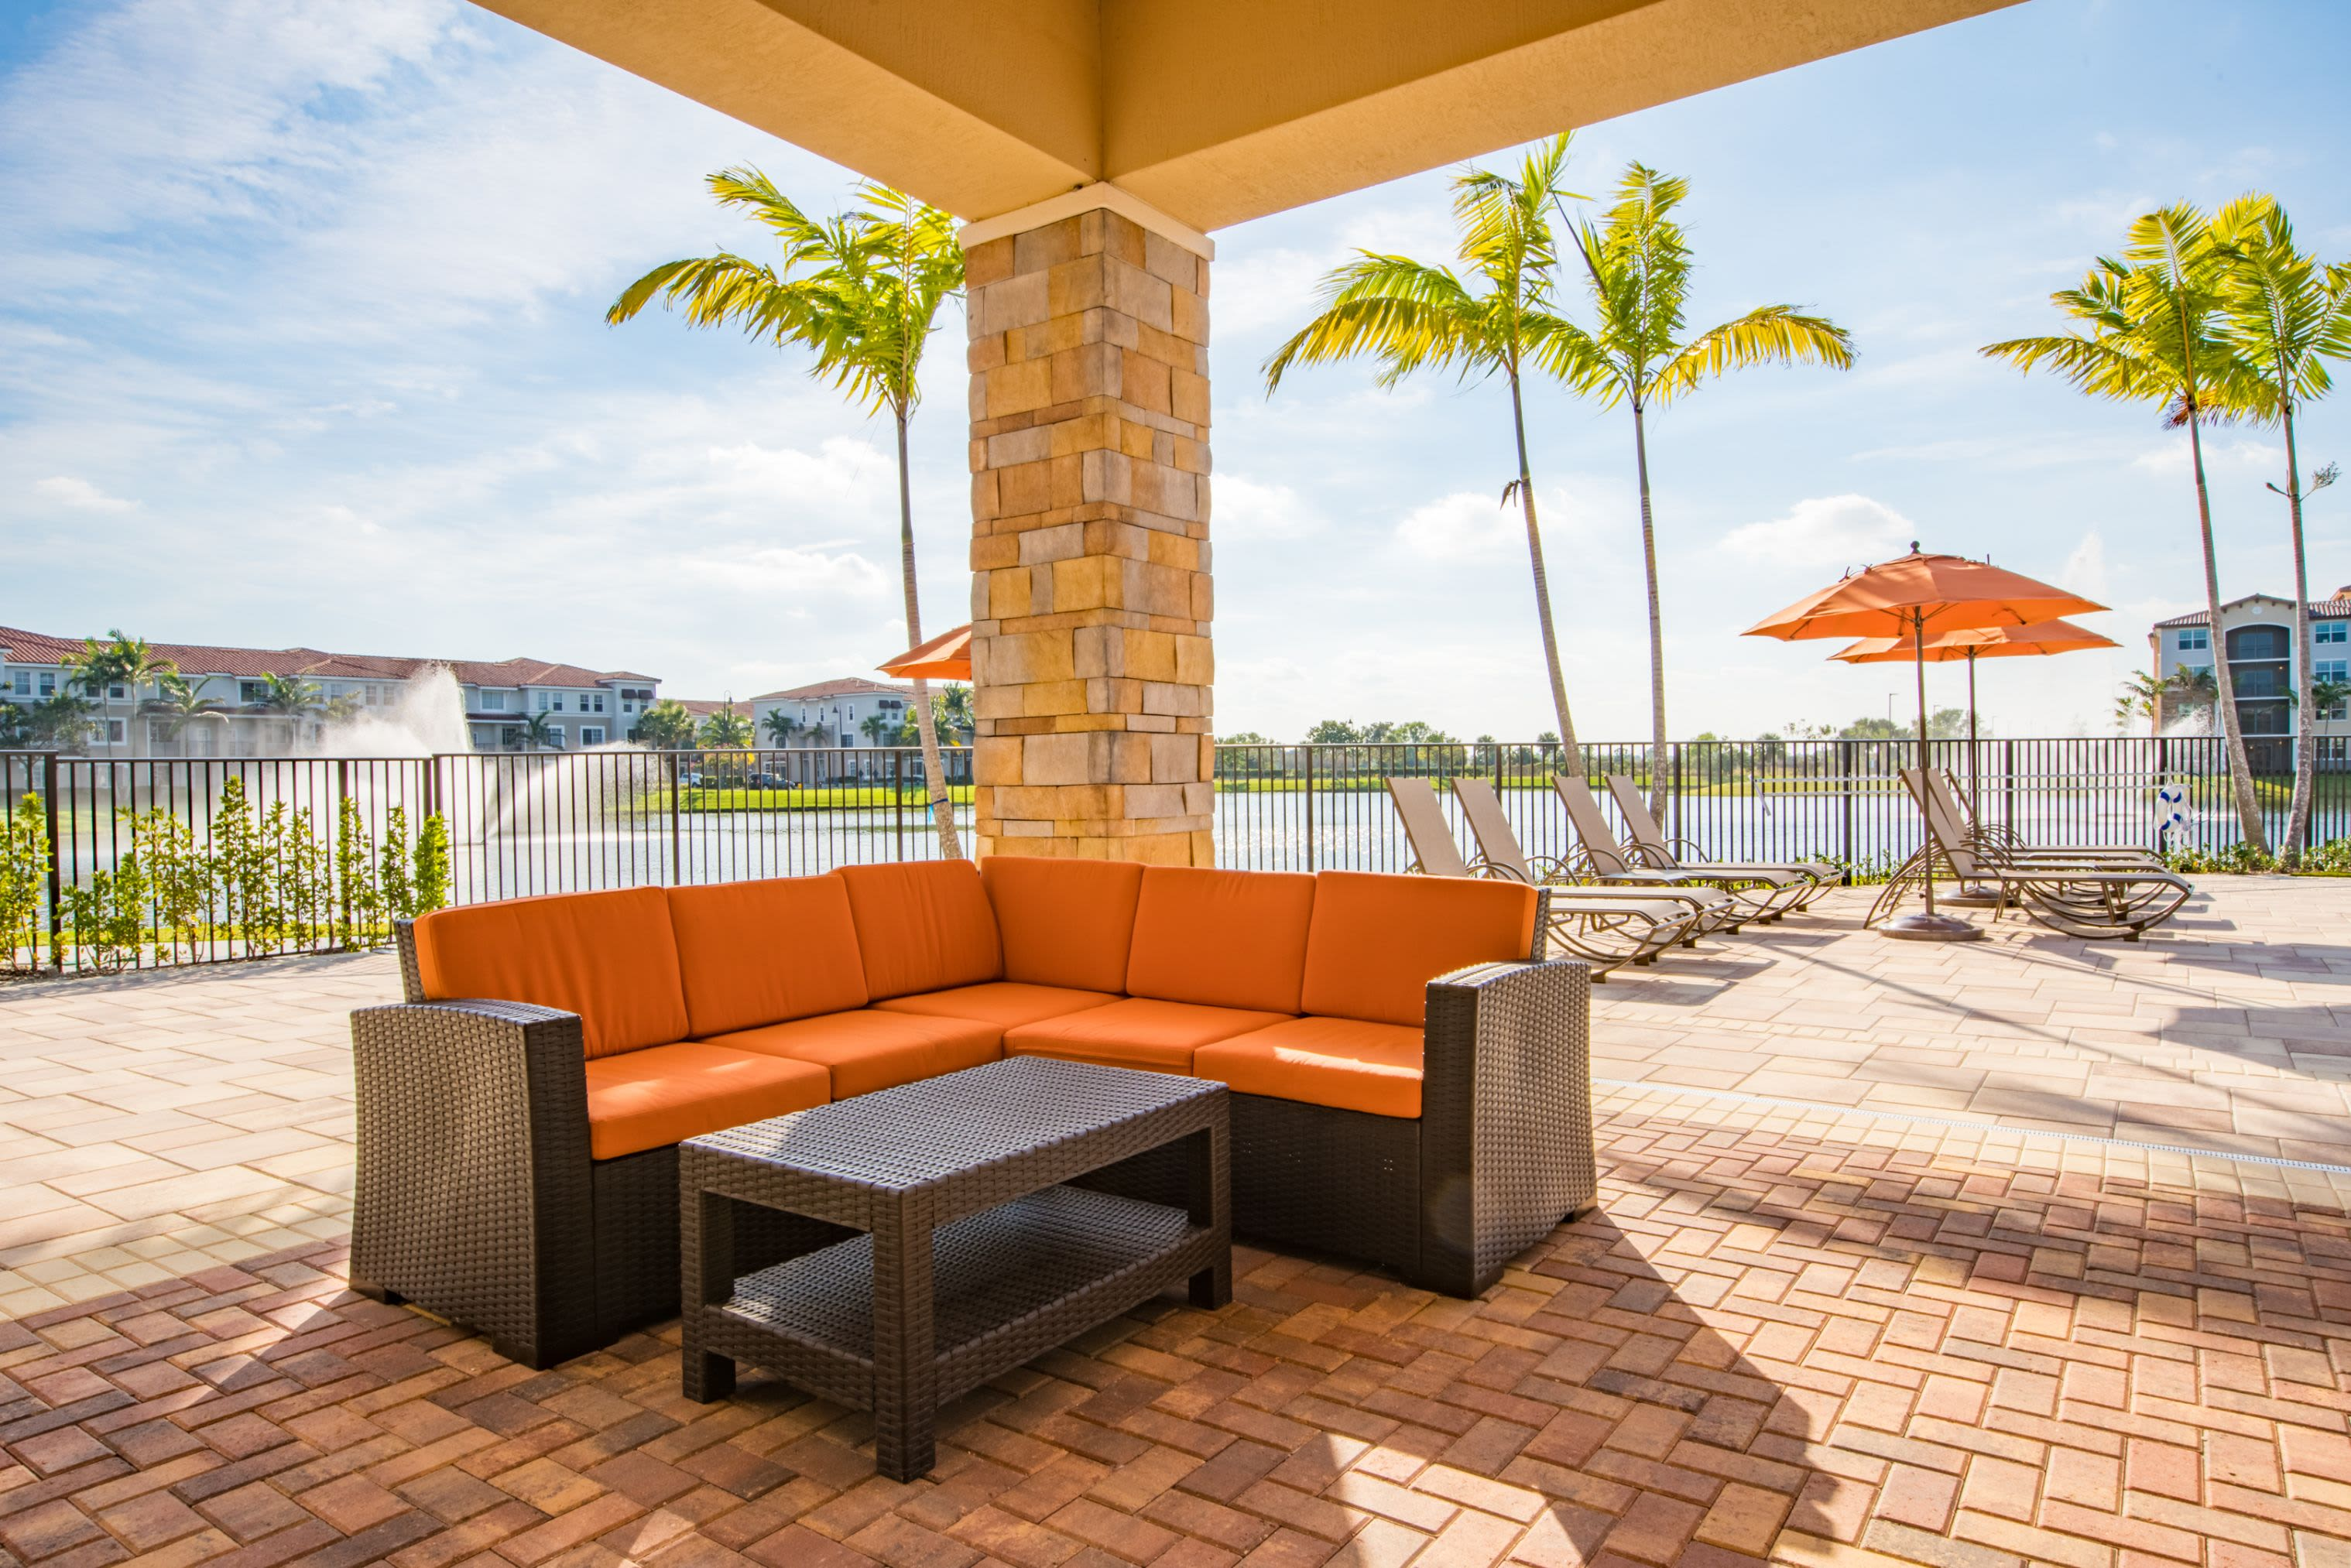 Outdoor Resident Seating at Luma Miramar Apartments in Miramar, Florida